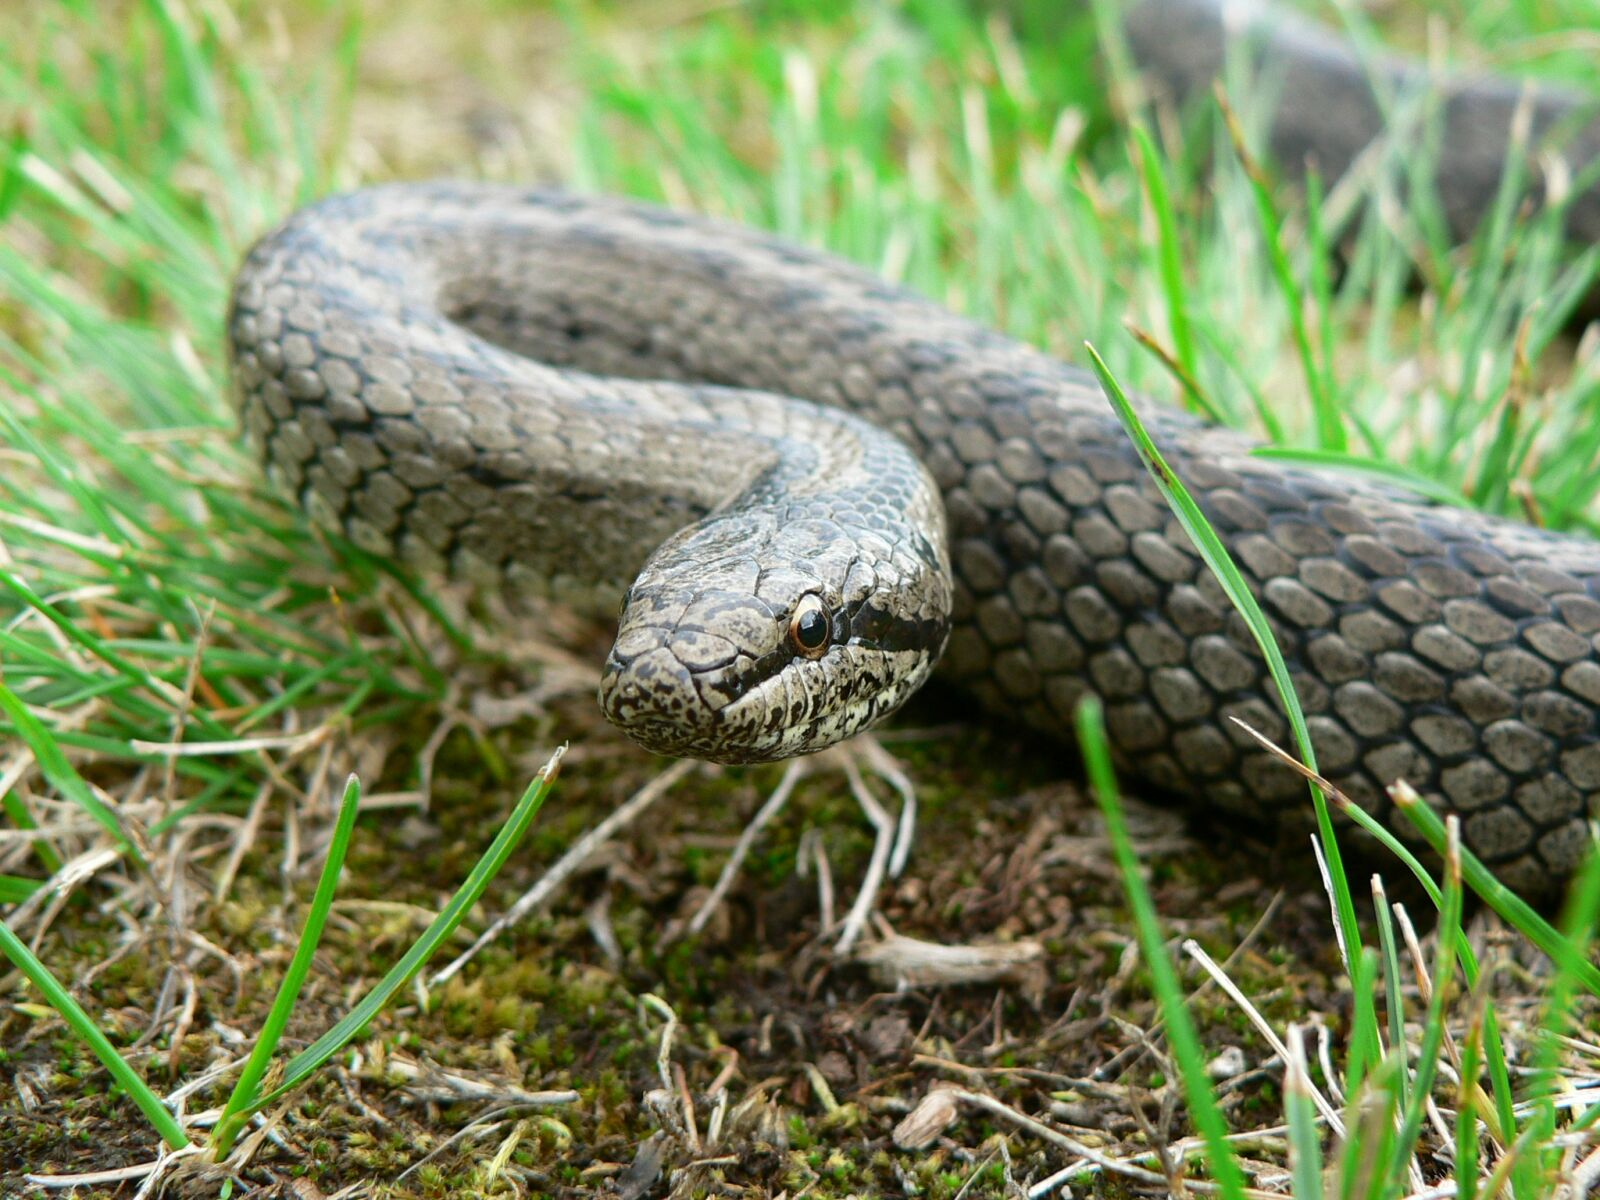 reptiles, snake